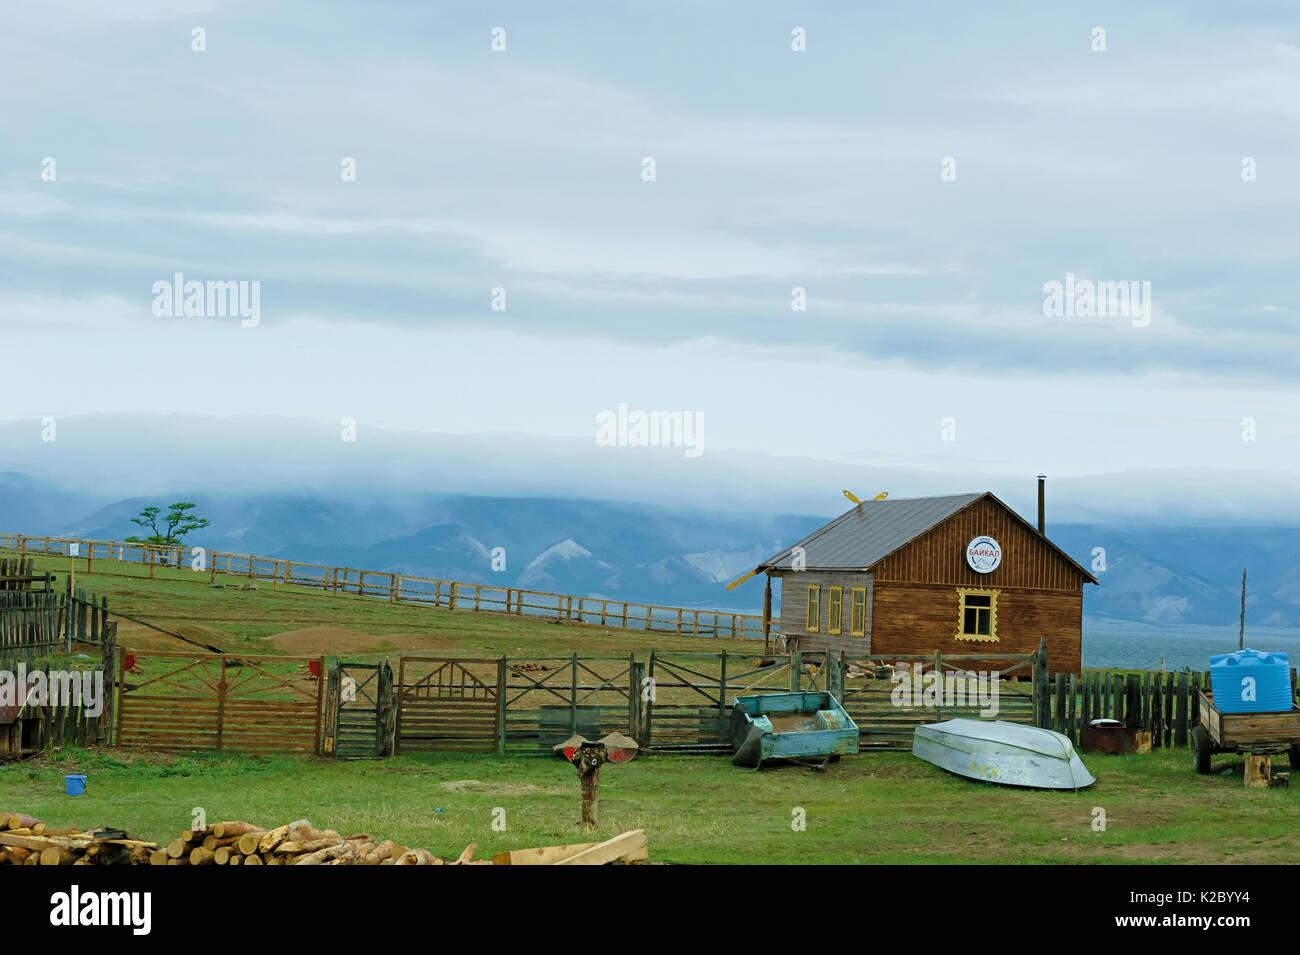 Huzhir village, Olkhon island, Lake Baikal, Russia, June 2014. - Stock Image